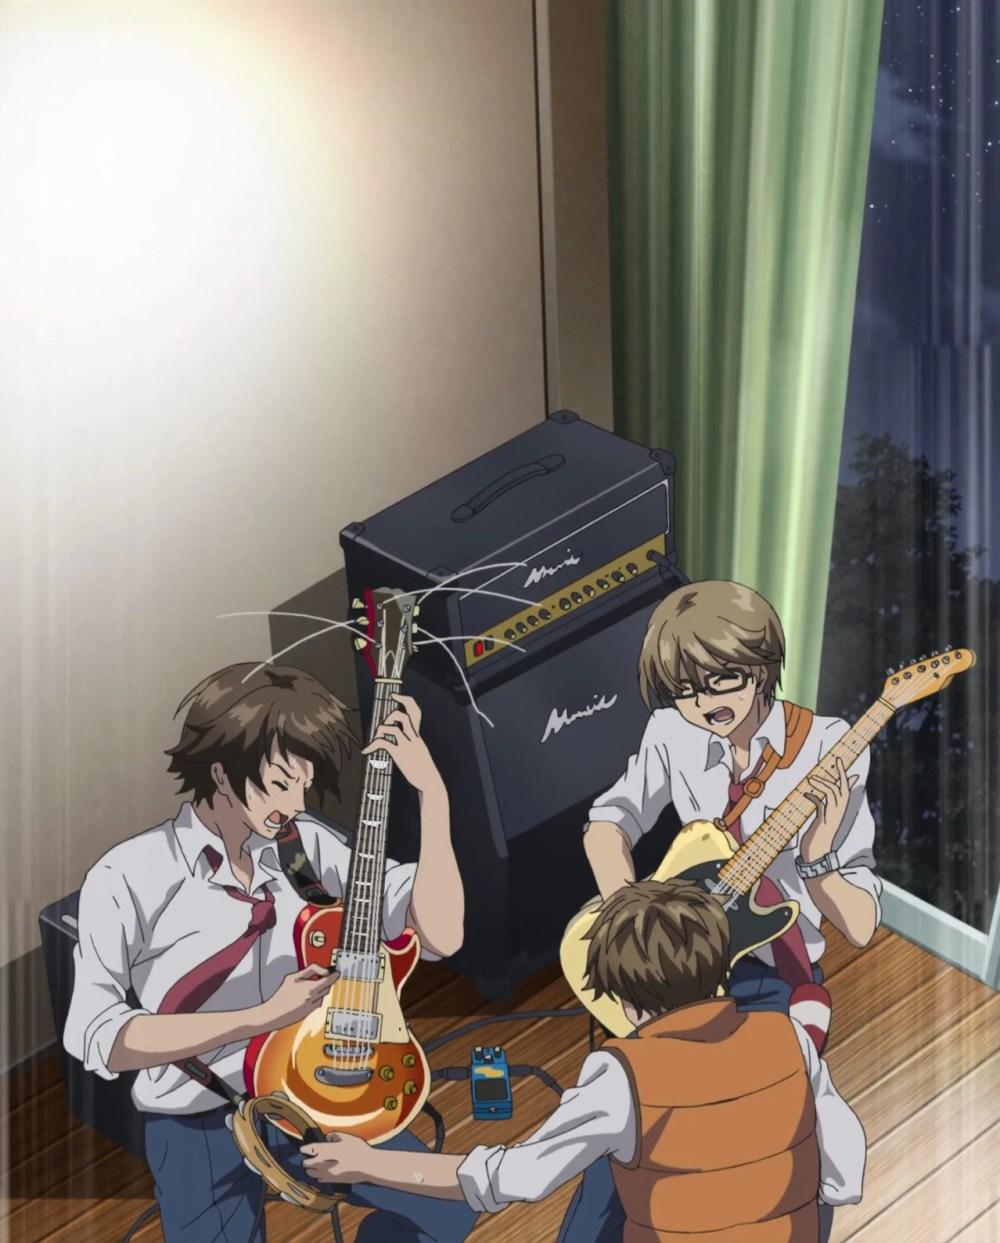 ousama-game-episodio-02-1.jpg